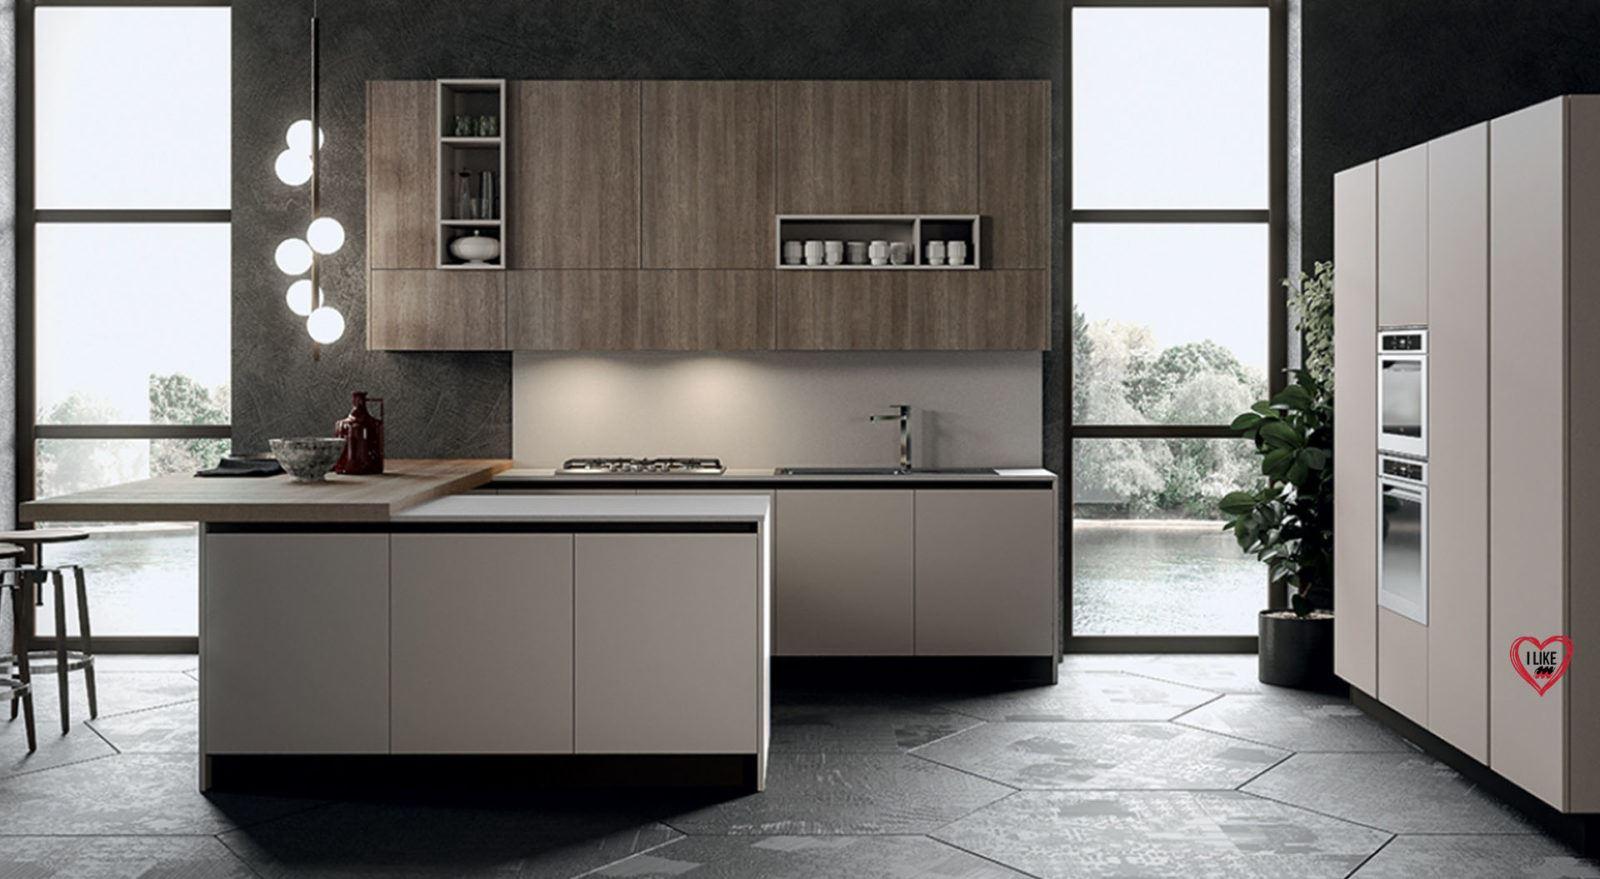 136 Cucine Isola Moderne - 30 cucine moderne con isola ...